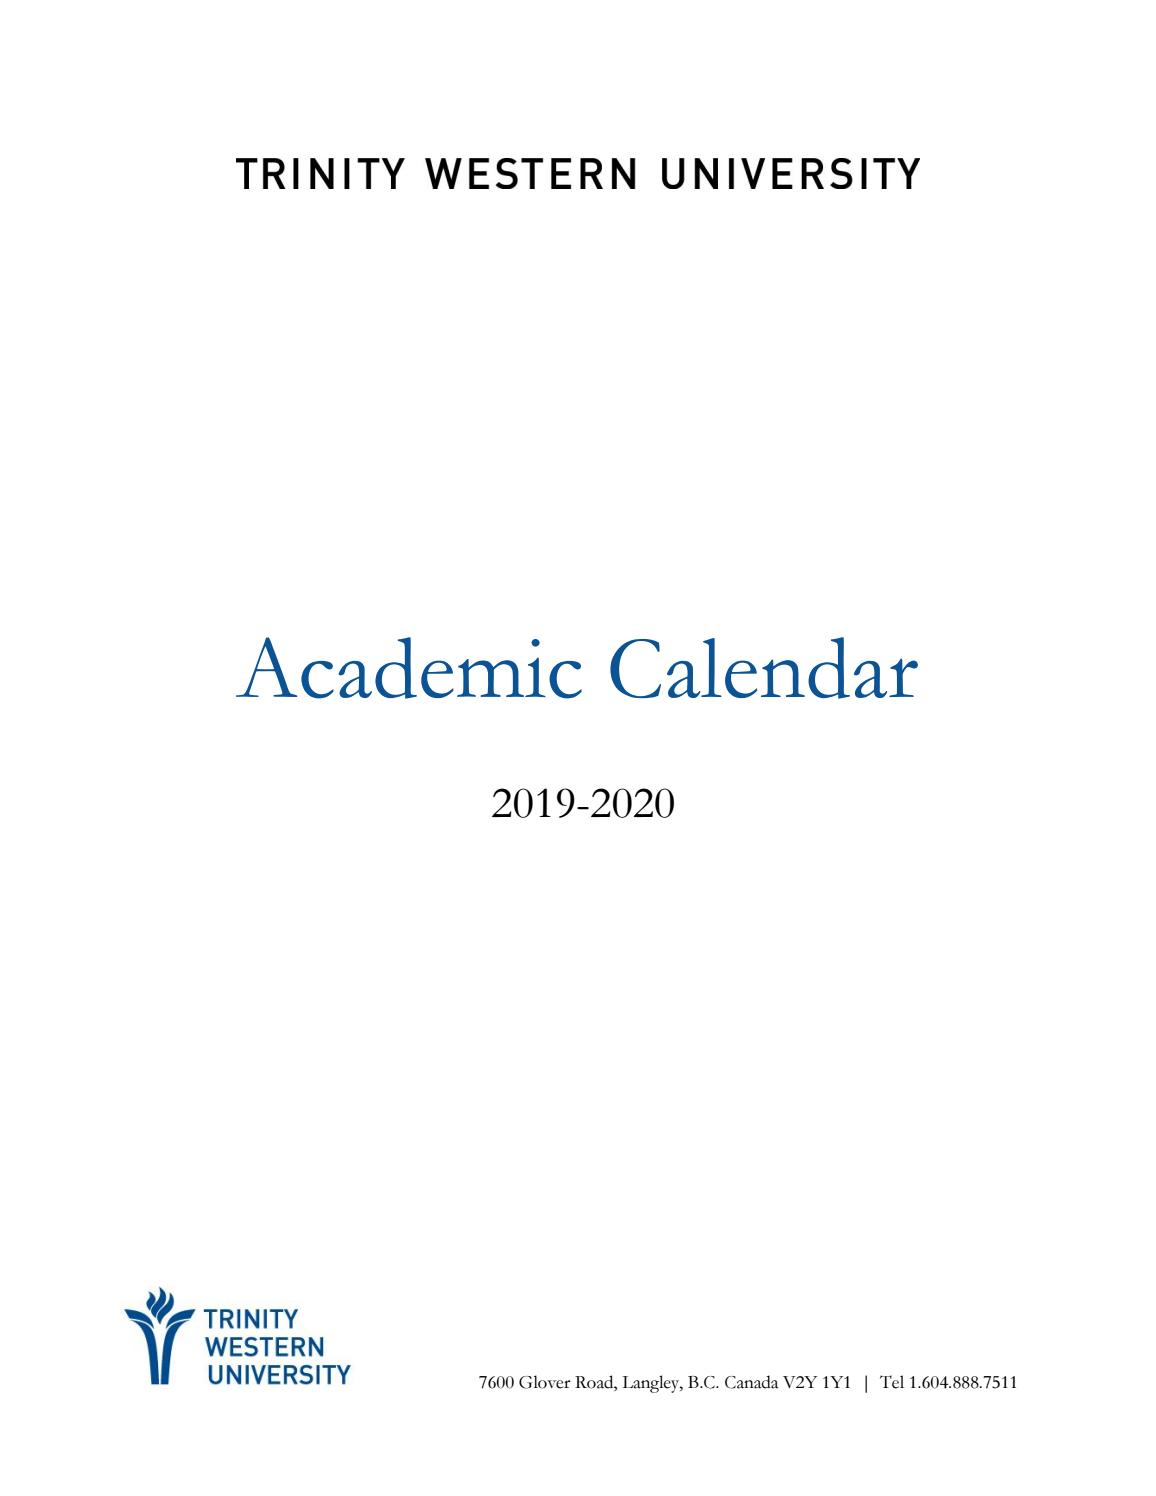 2019-20 Academic Calendartwu - Issuu